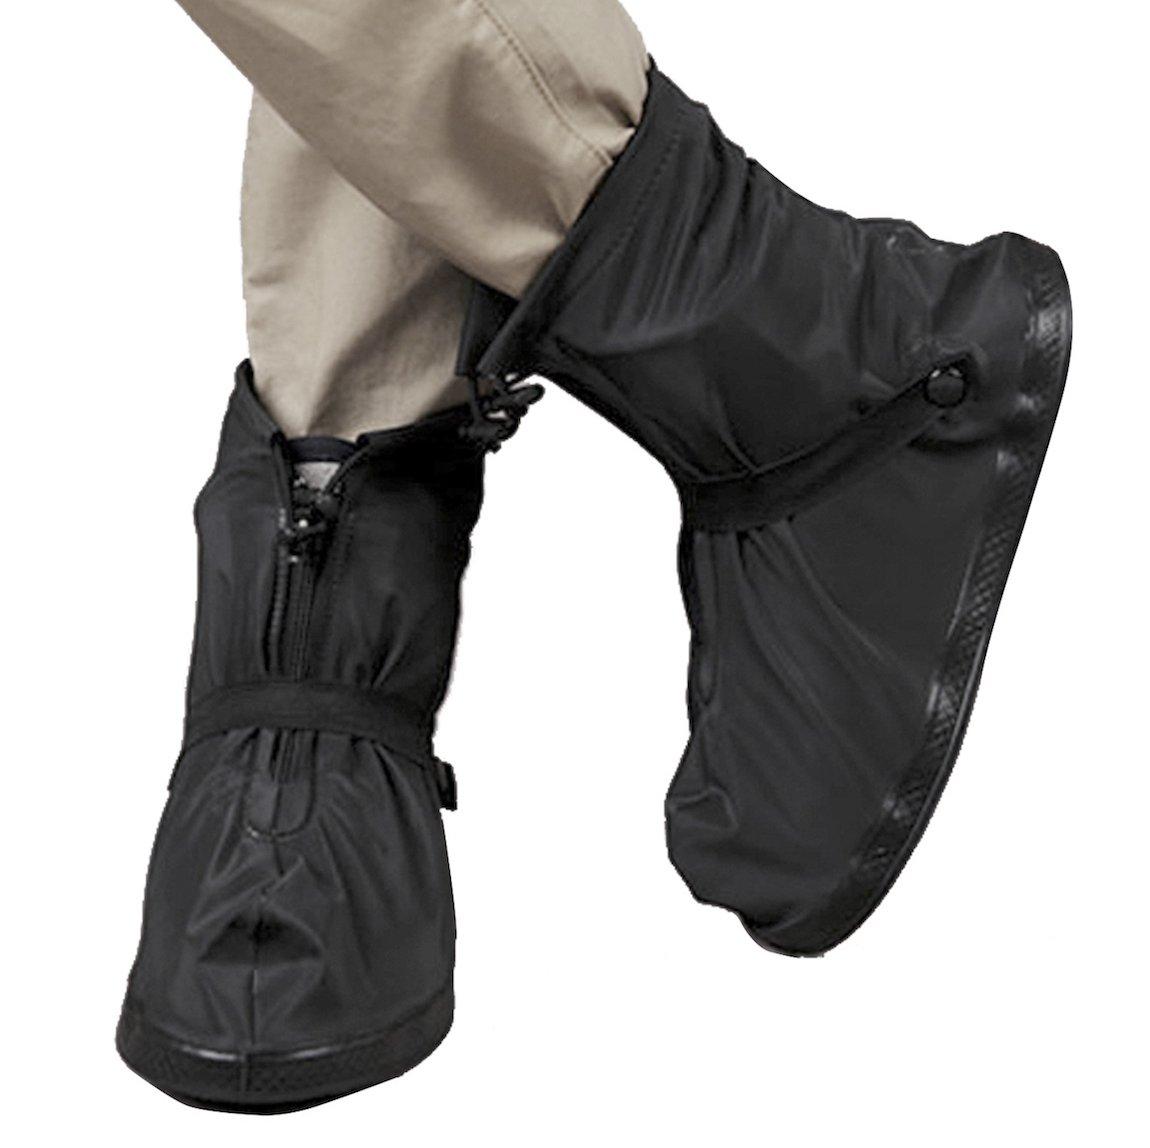 SZAT PRO Black Rain Boot Shoe Covers Waterproof Travel Snow Overshoes(XXXXL)